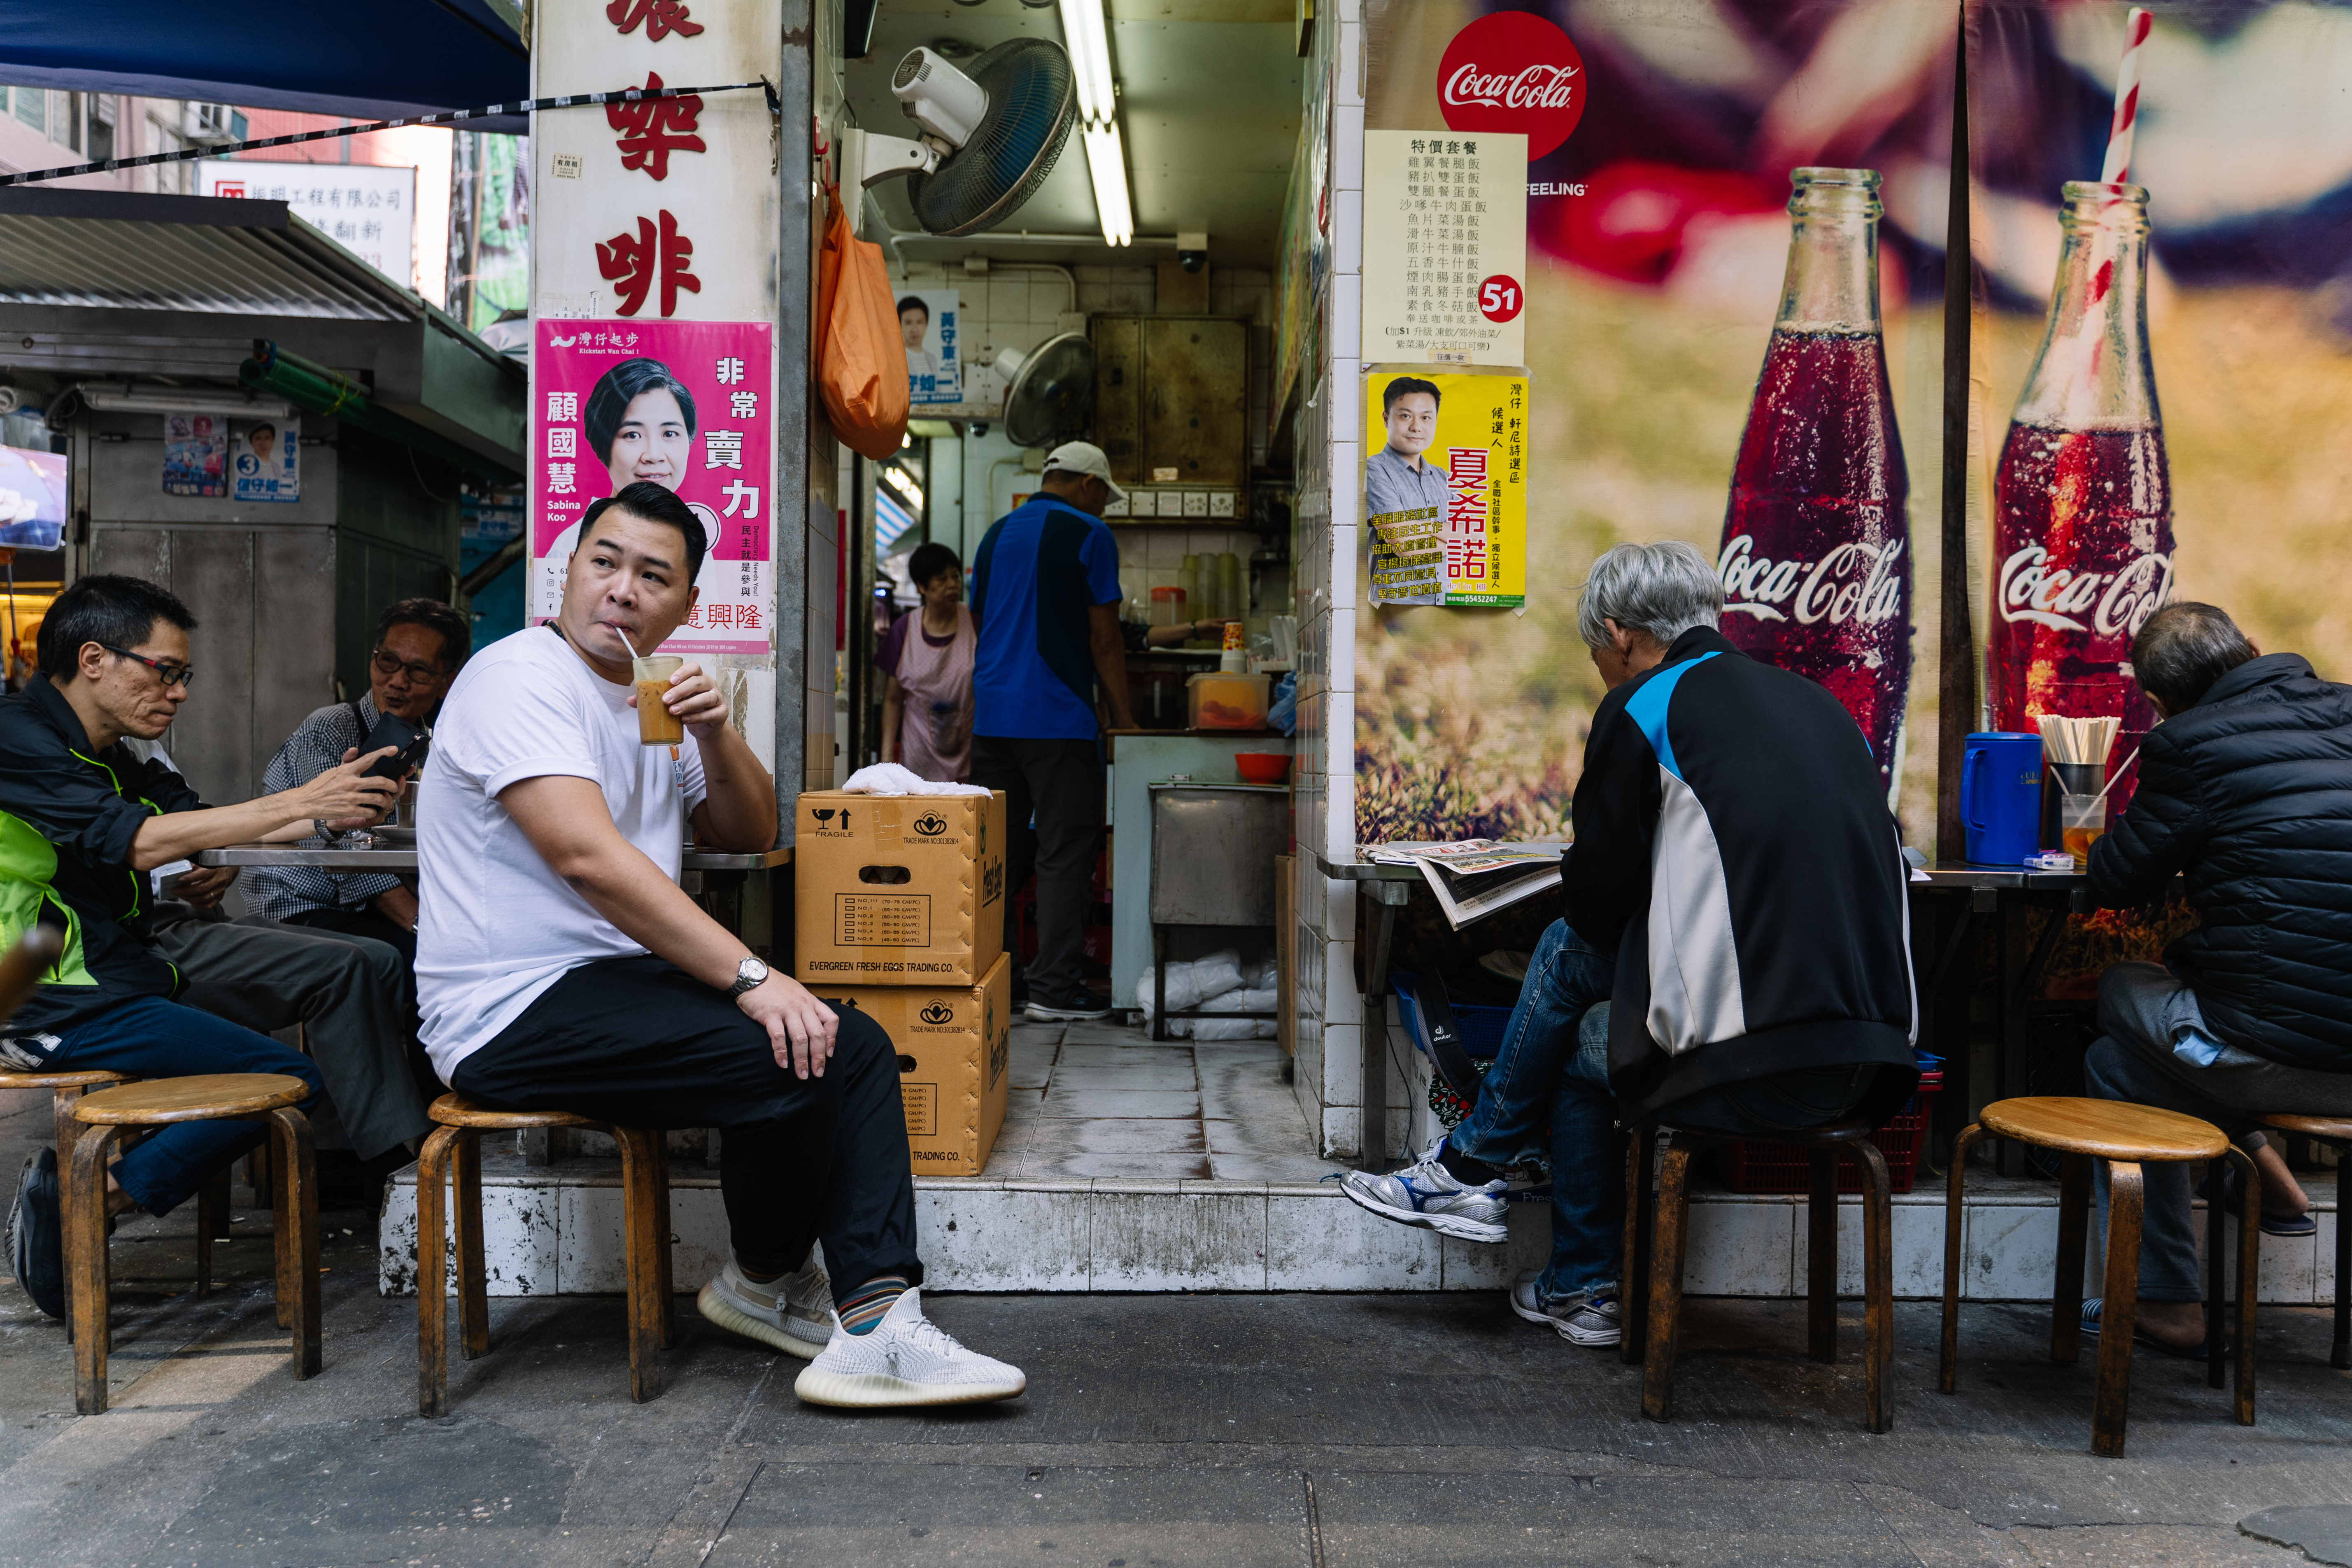 HK_AIRLINES_GDK (18 of 18)